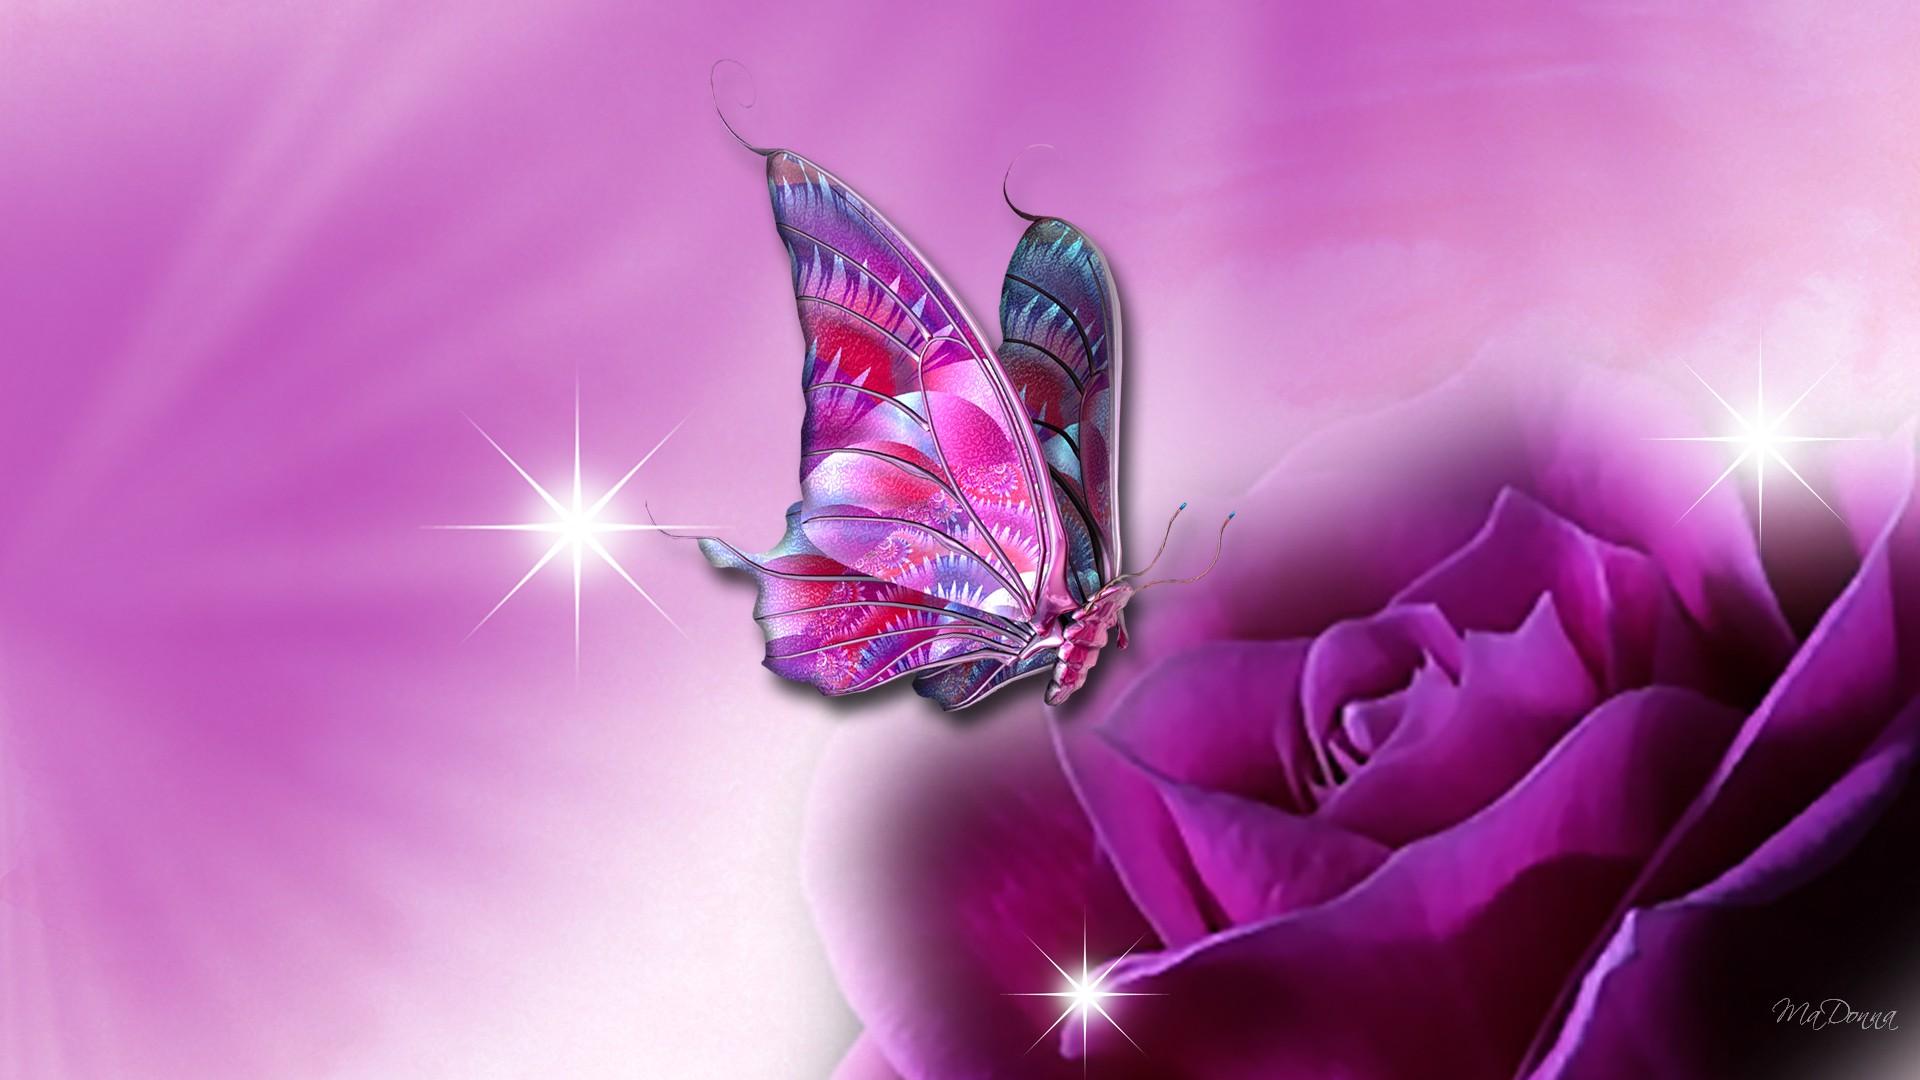 Butterfly Wallpaper For Desktop wallpapers55com   Best Wallpapers 1920x1080